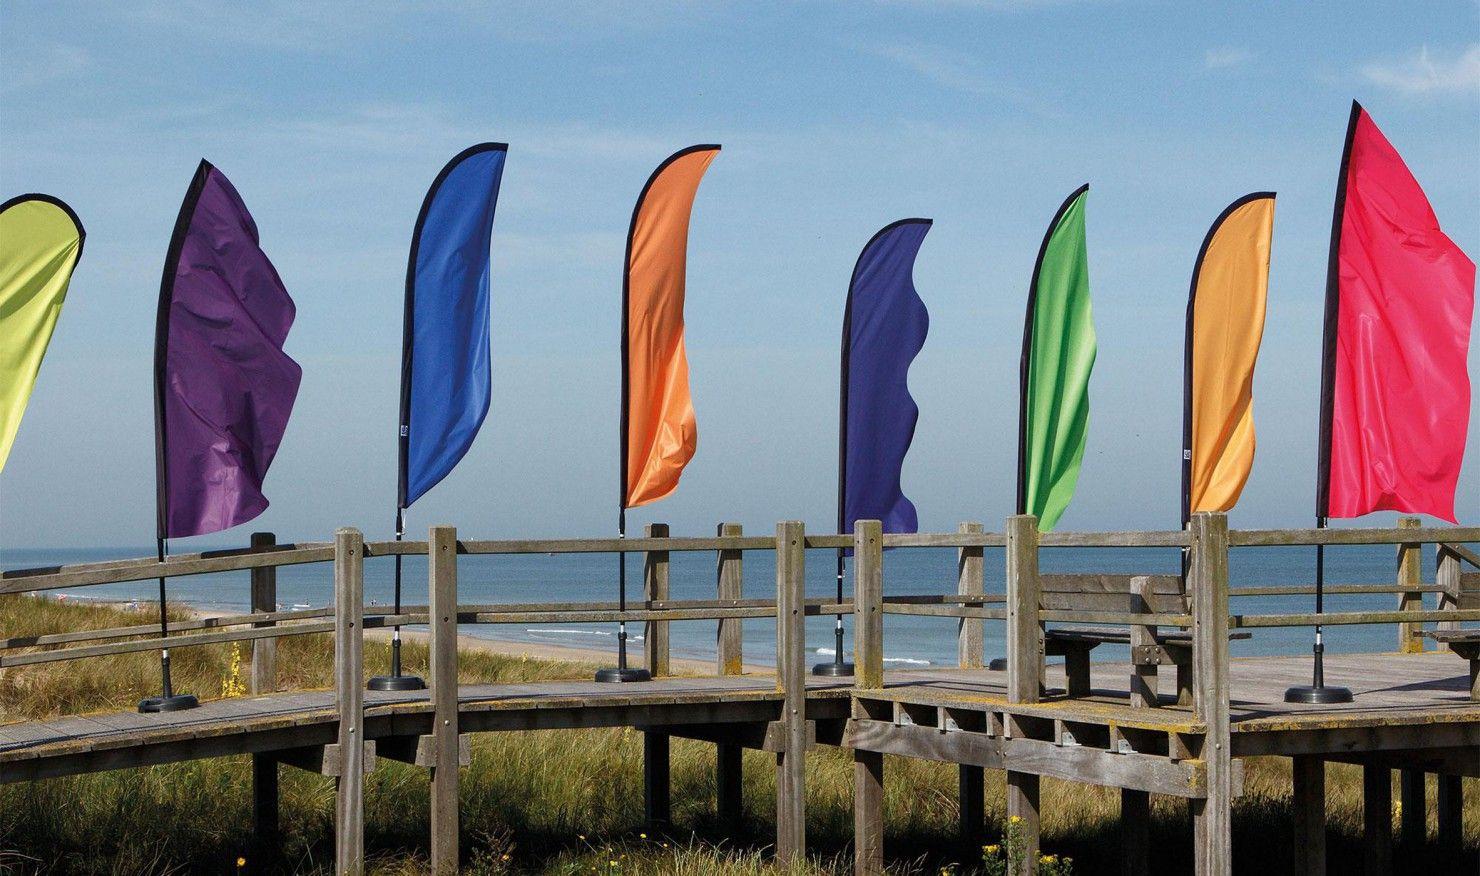 beachflag_4bc2d037935769075a168599ddd8542f